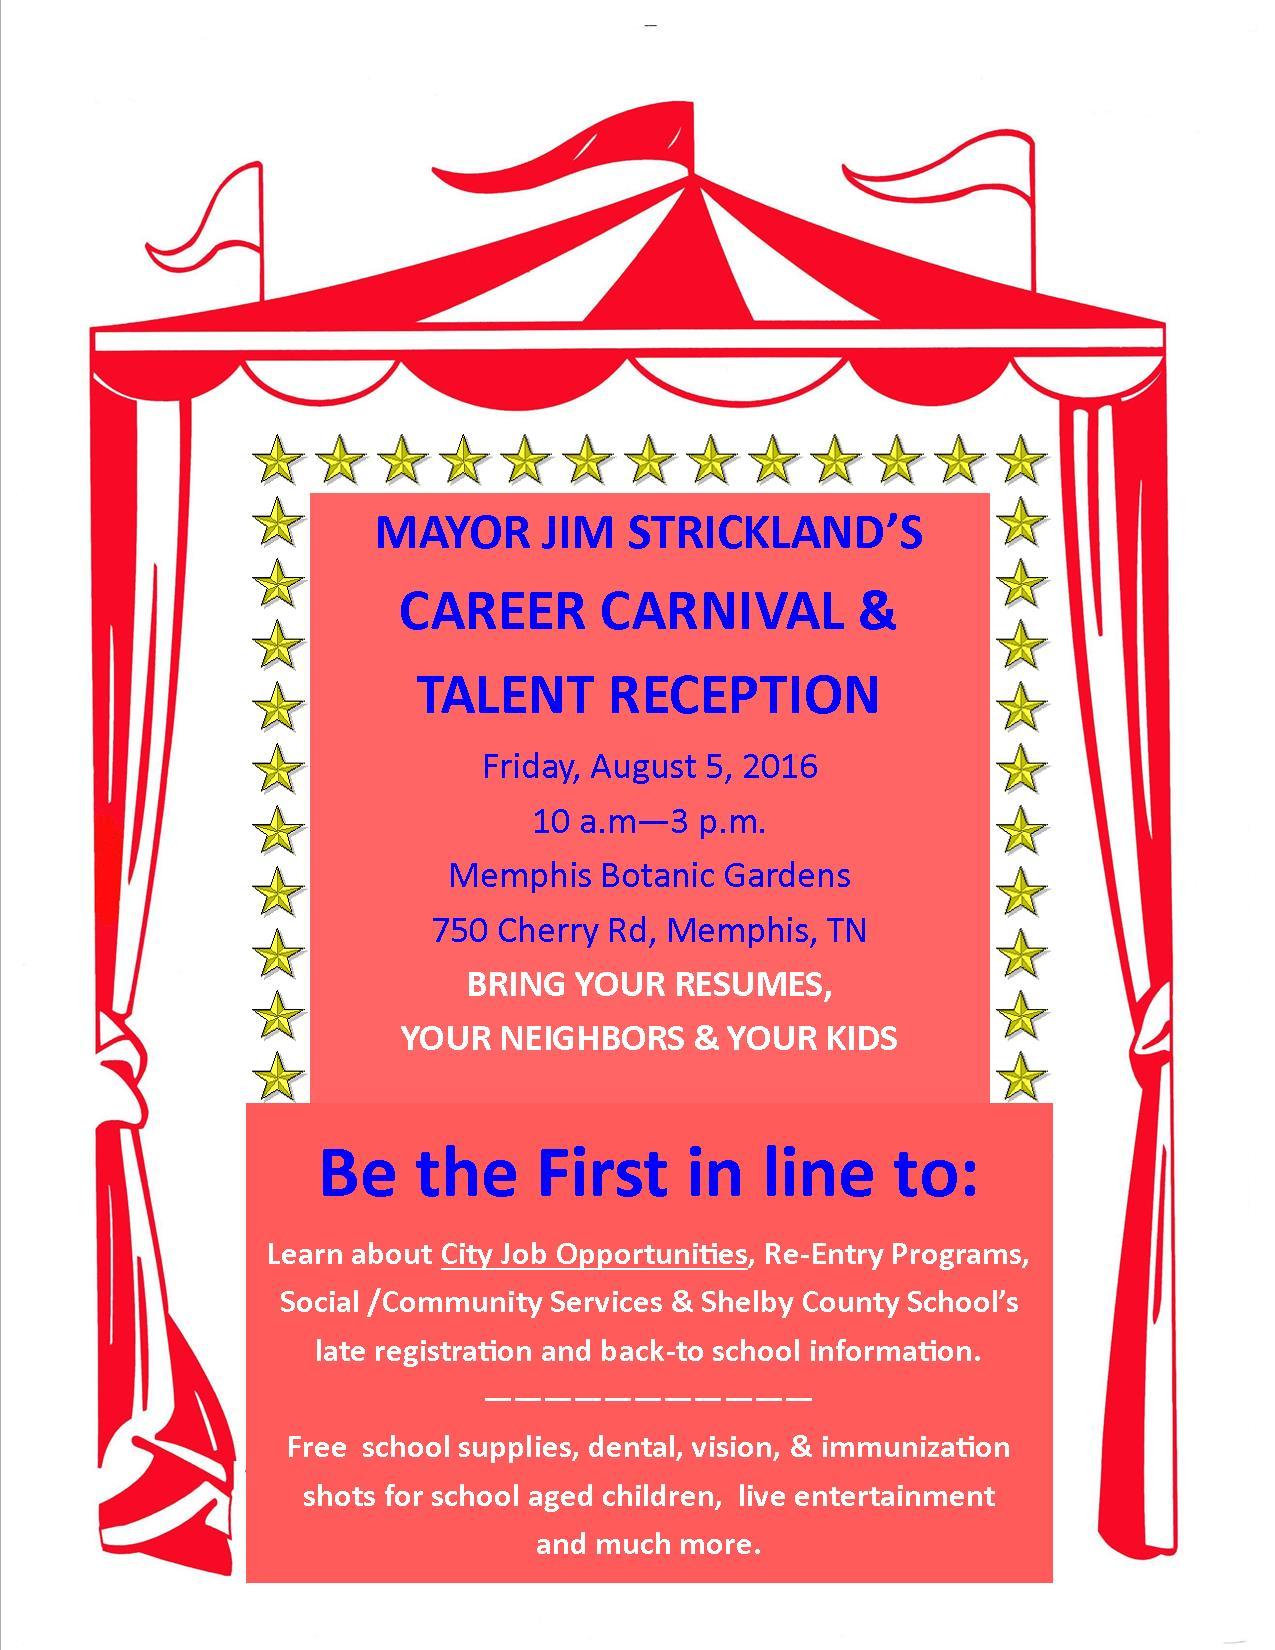 City of memphis Career Carnival Flyer 2